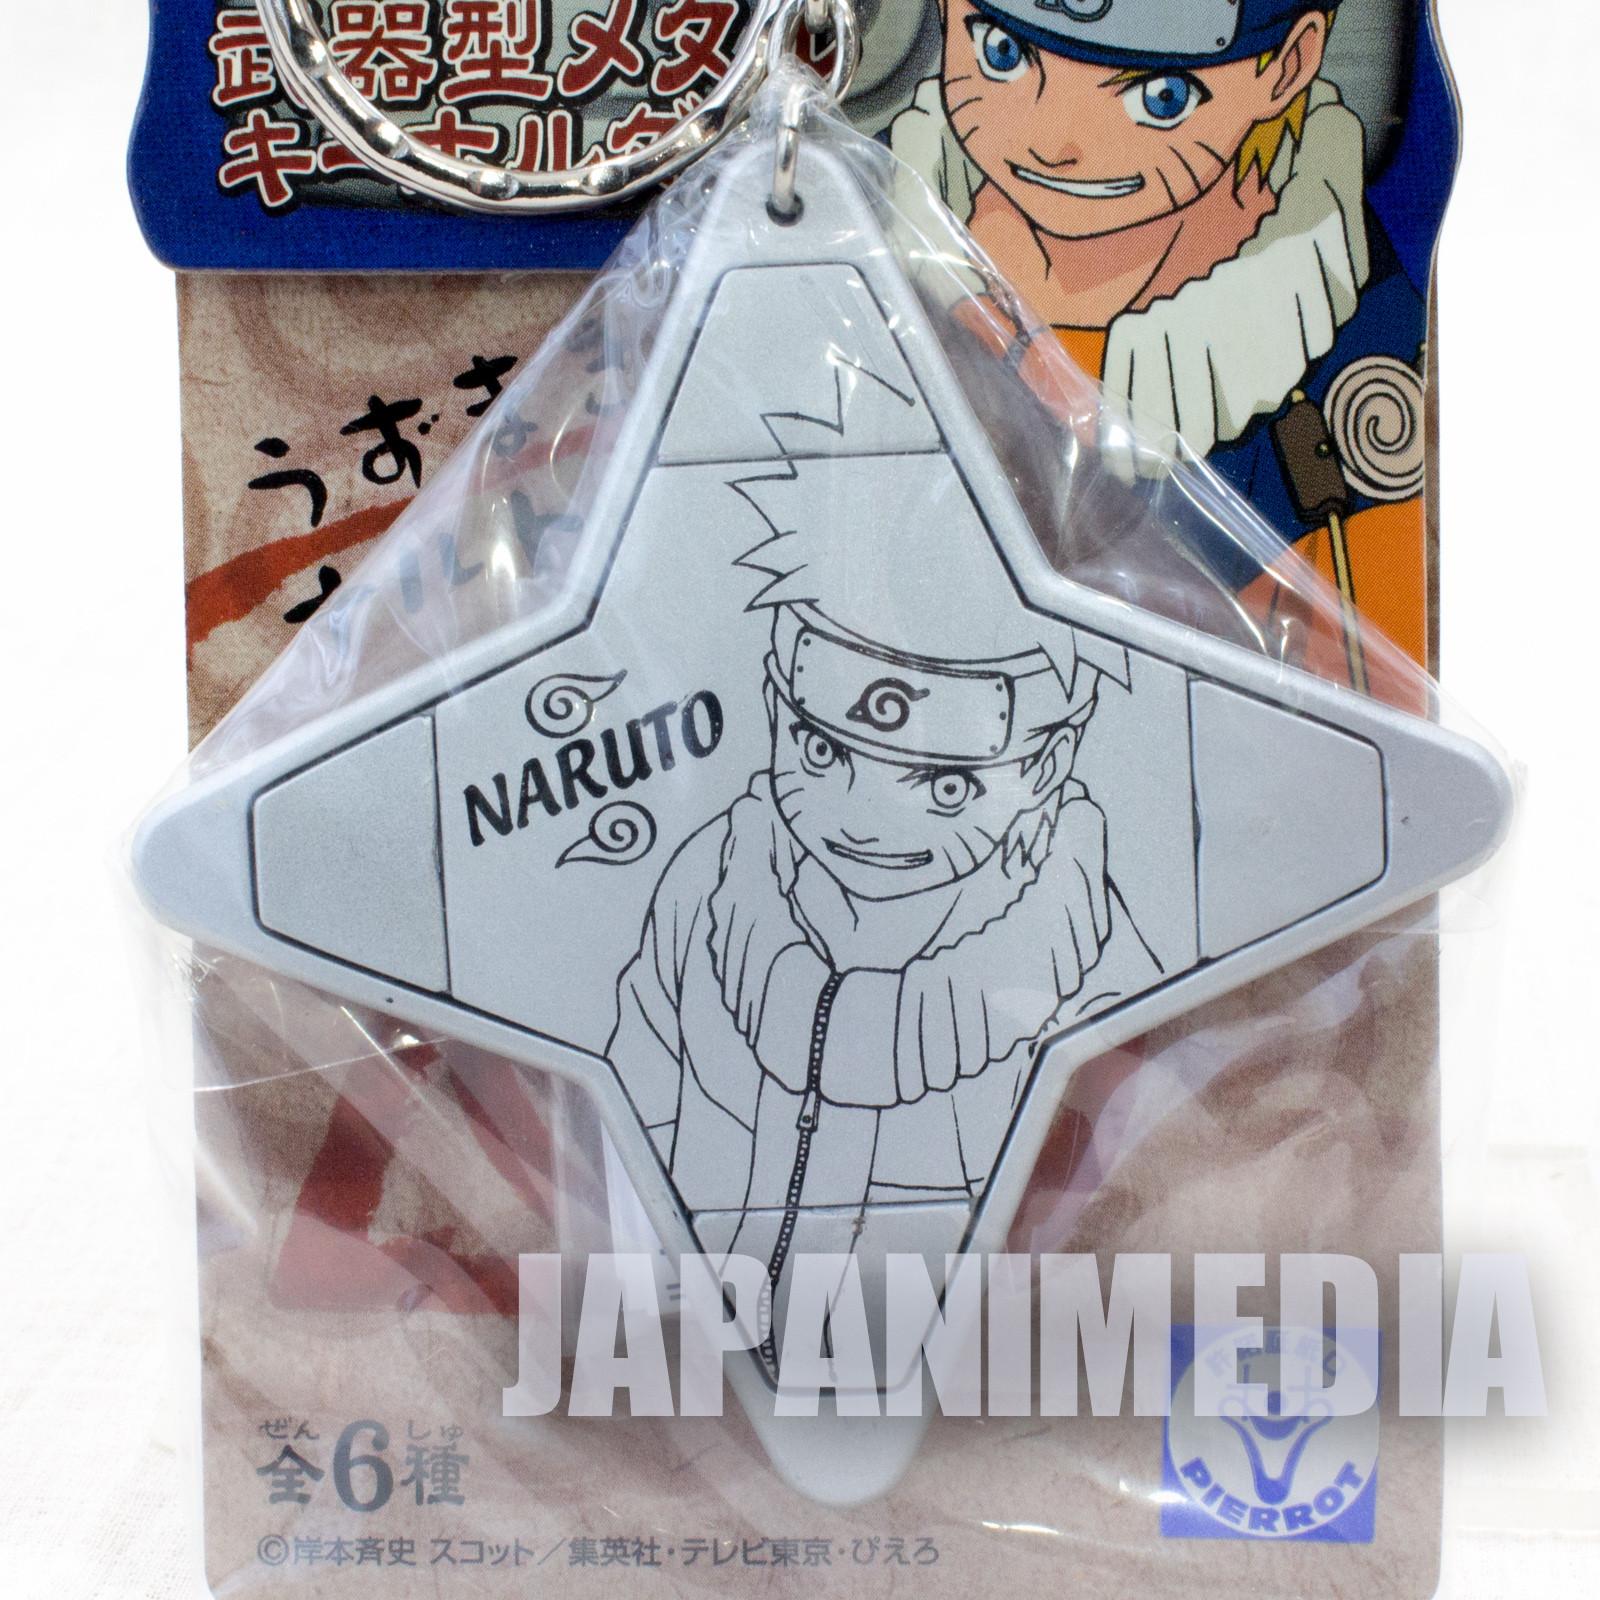 NARUTO Naruto Uzumaki Metal Keychain Banpresto JAPAN ANIME MANGA JUMP